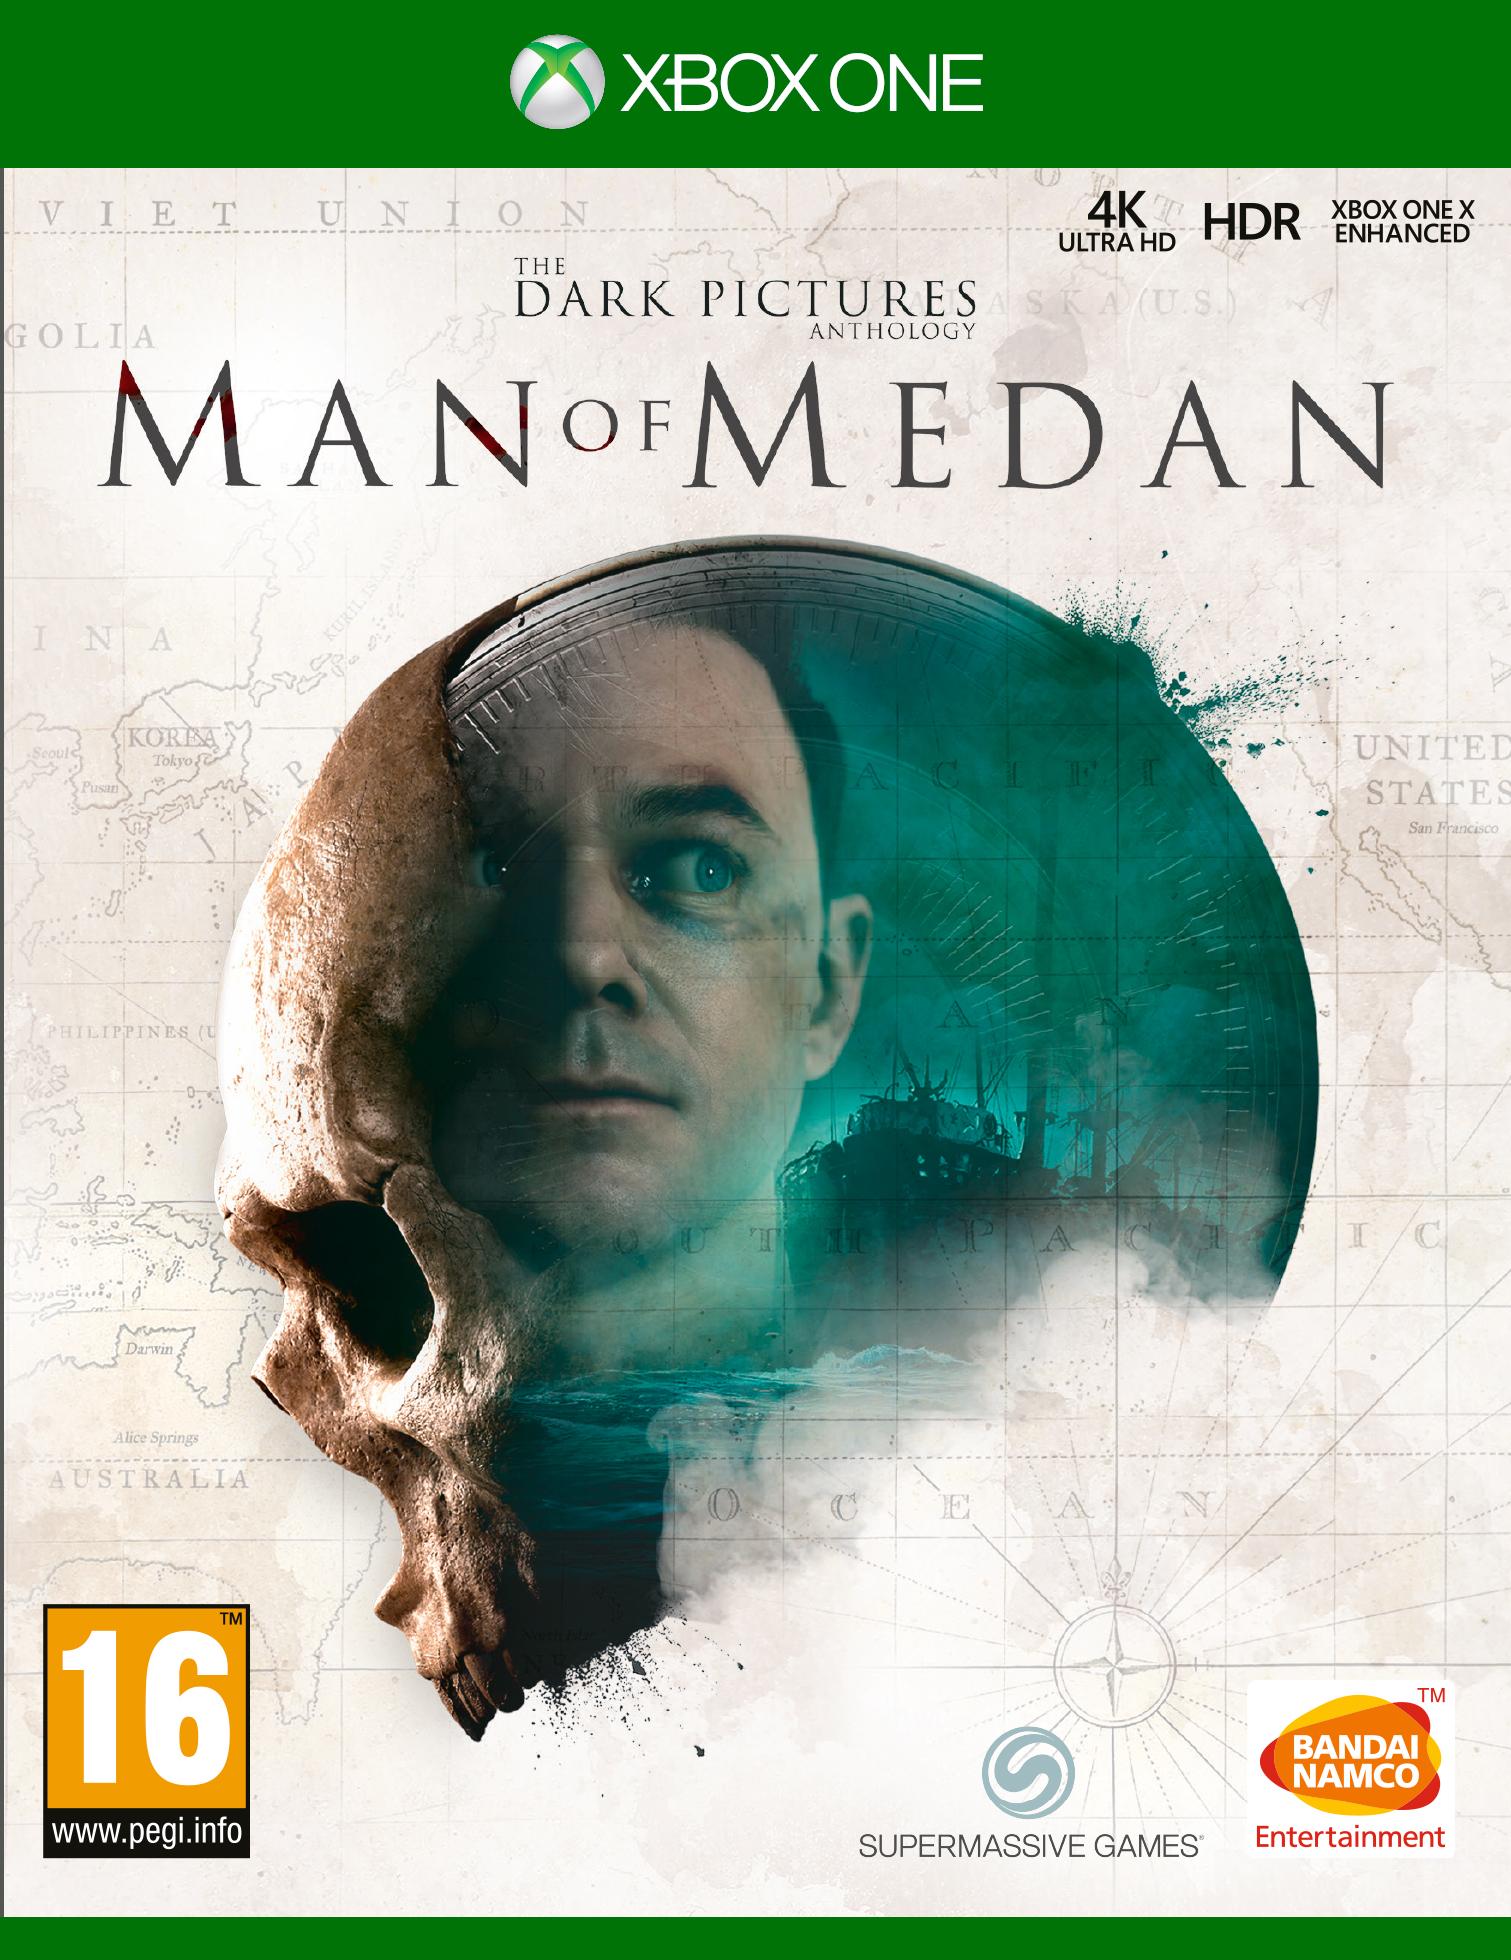 The Dark Pictures Anthology - Man of Medan